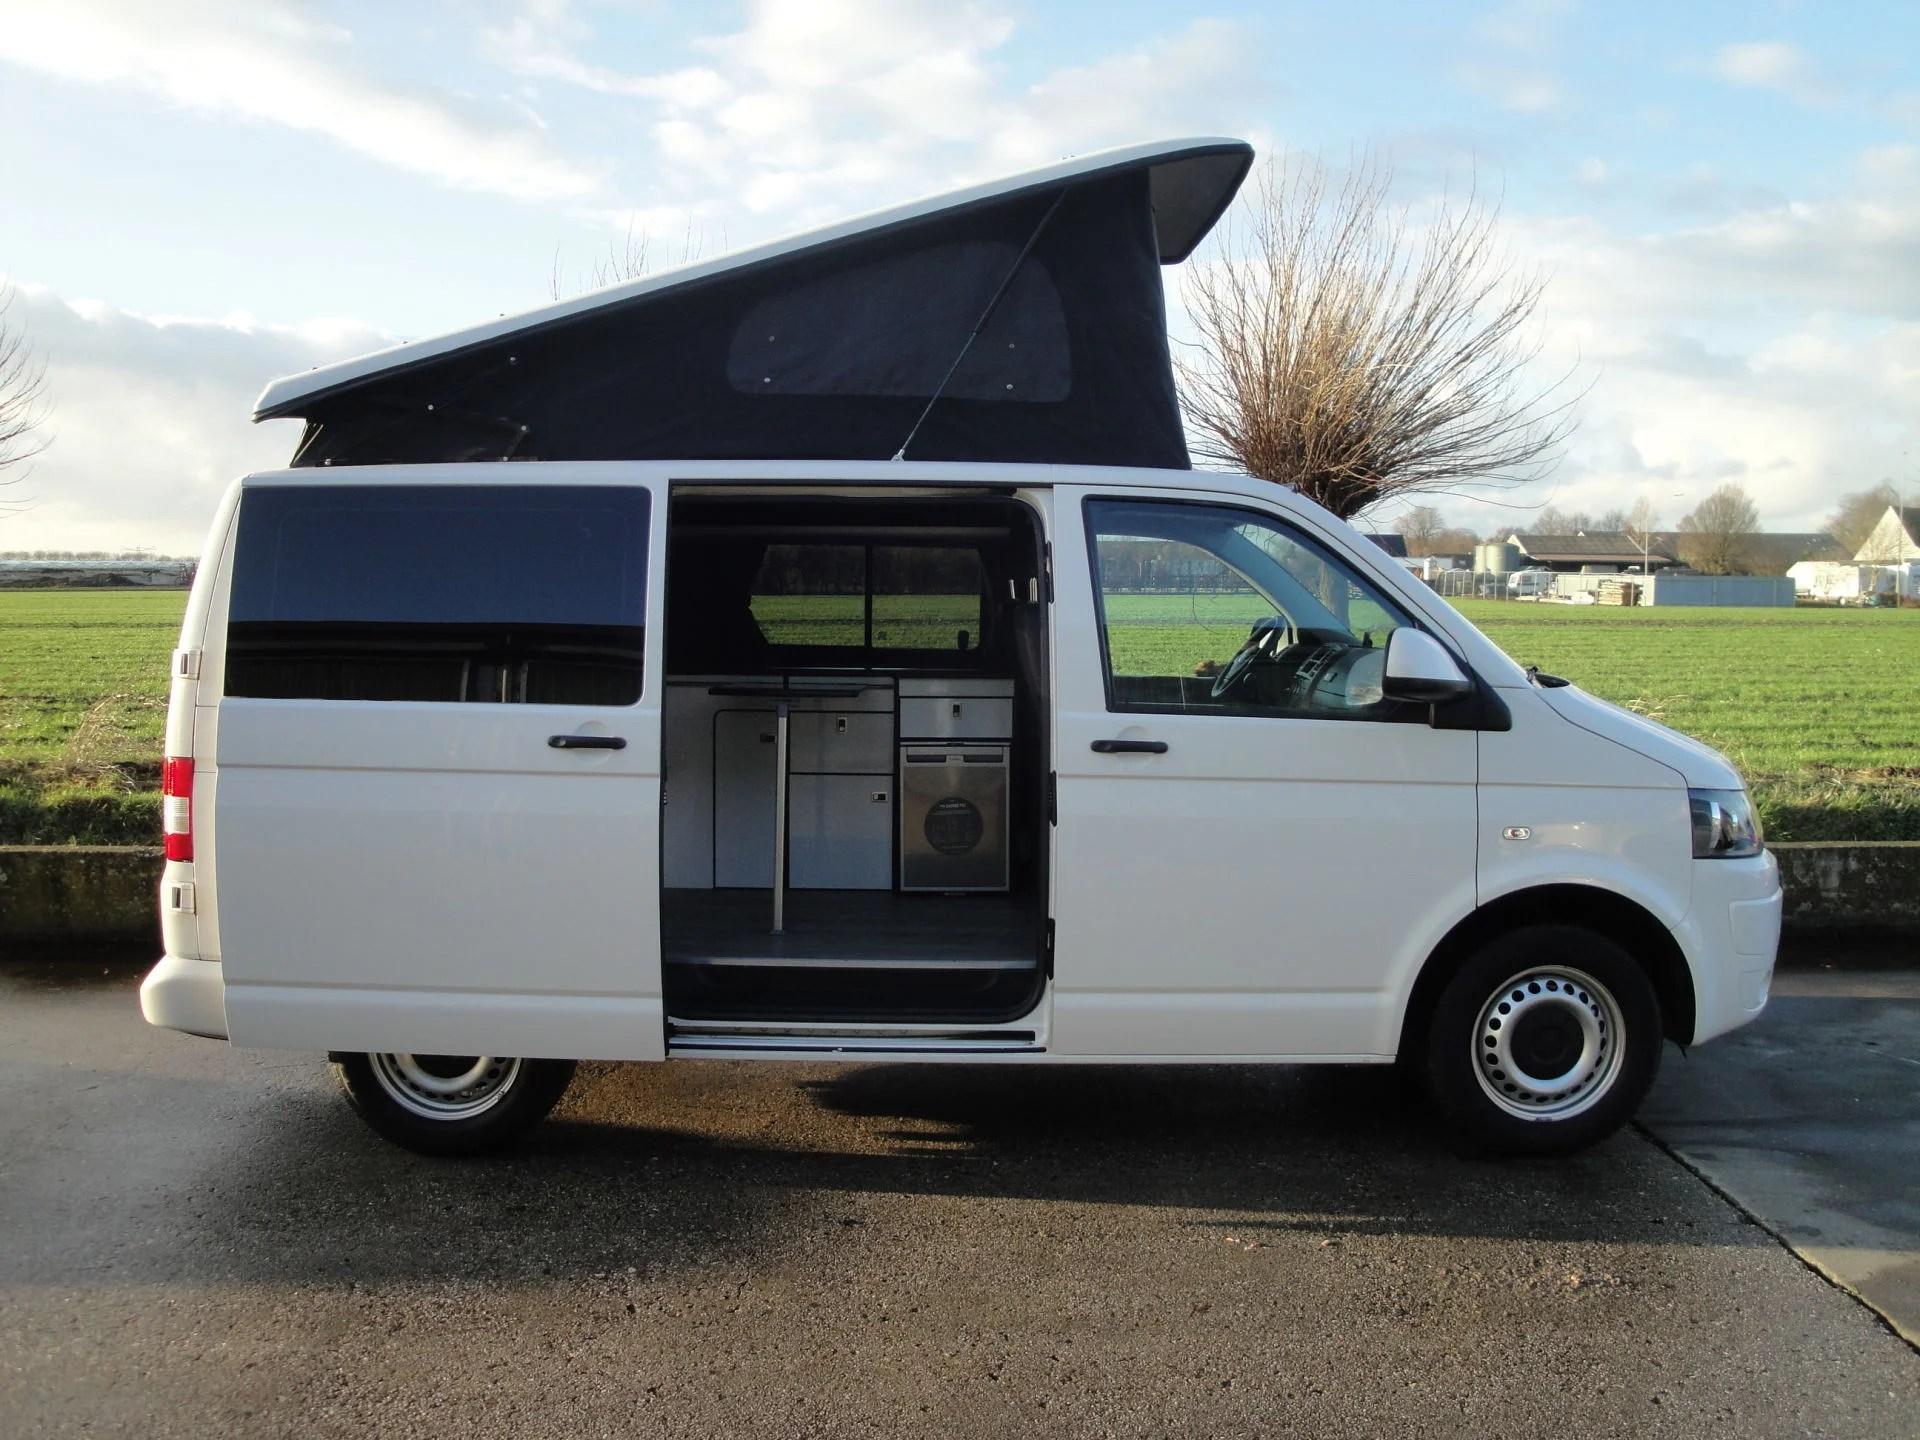 Te koop VW T5 camper Wit 2013  Occasions  Camperbouw